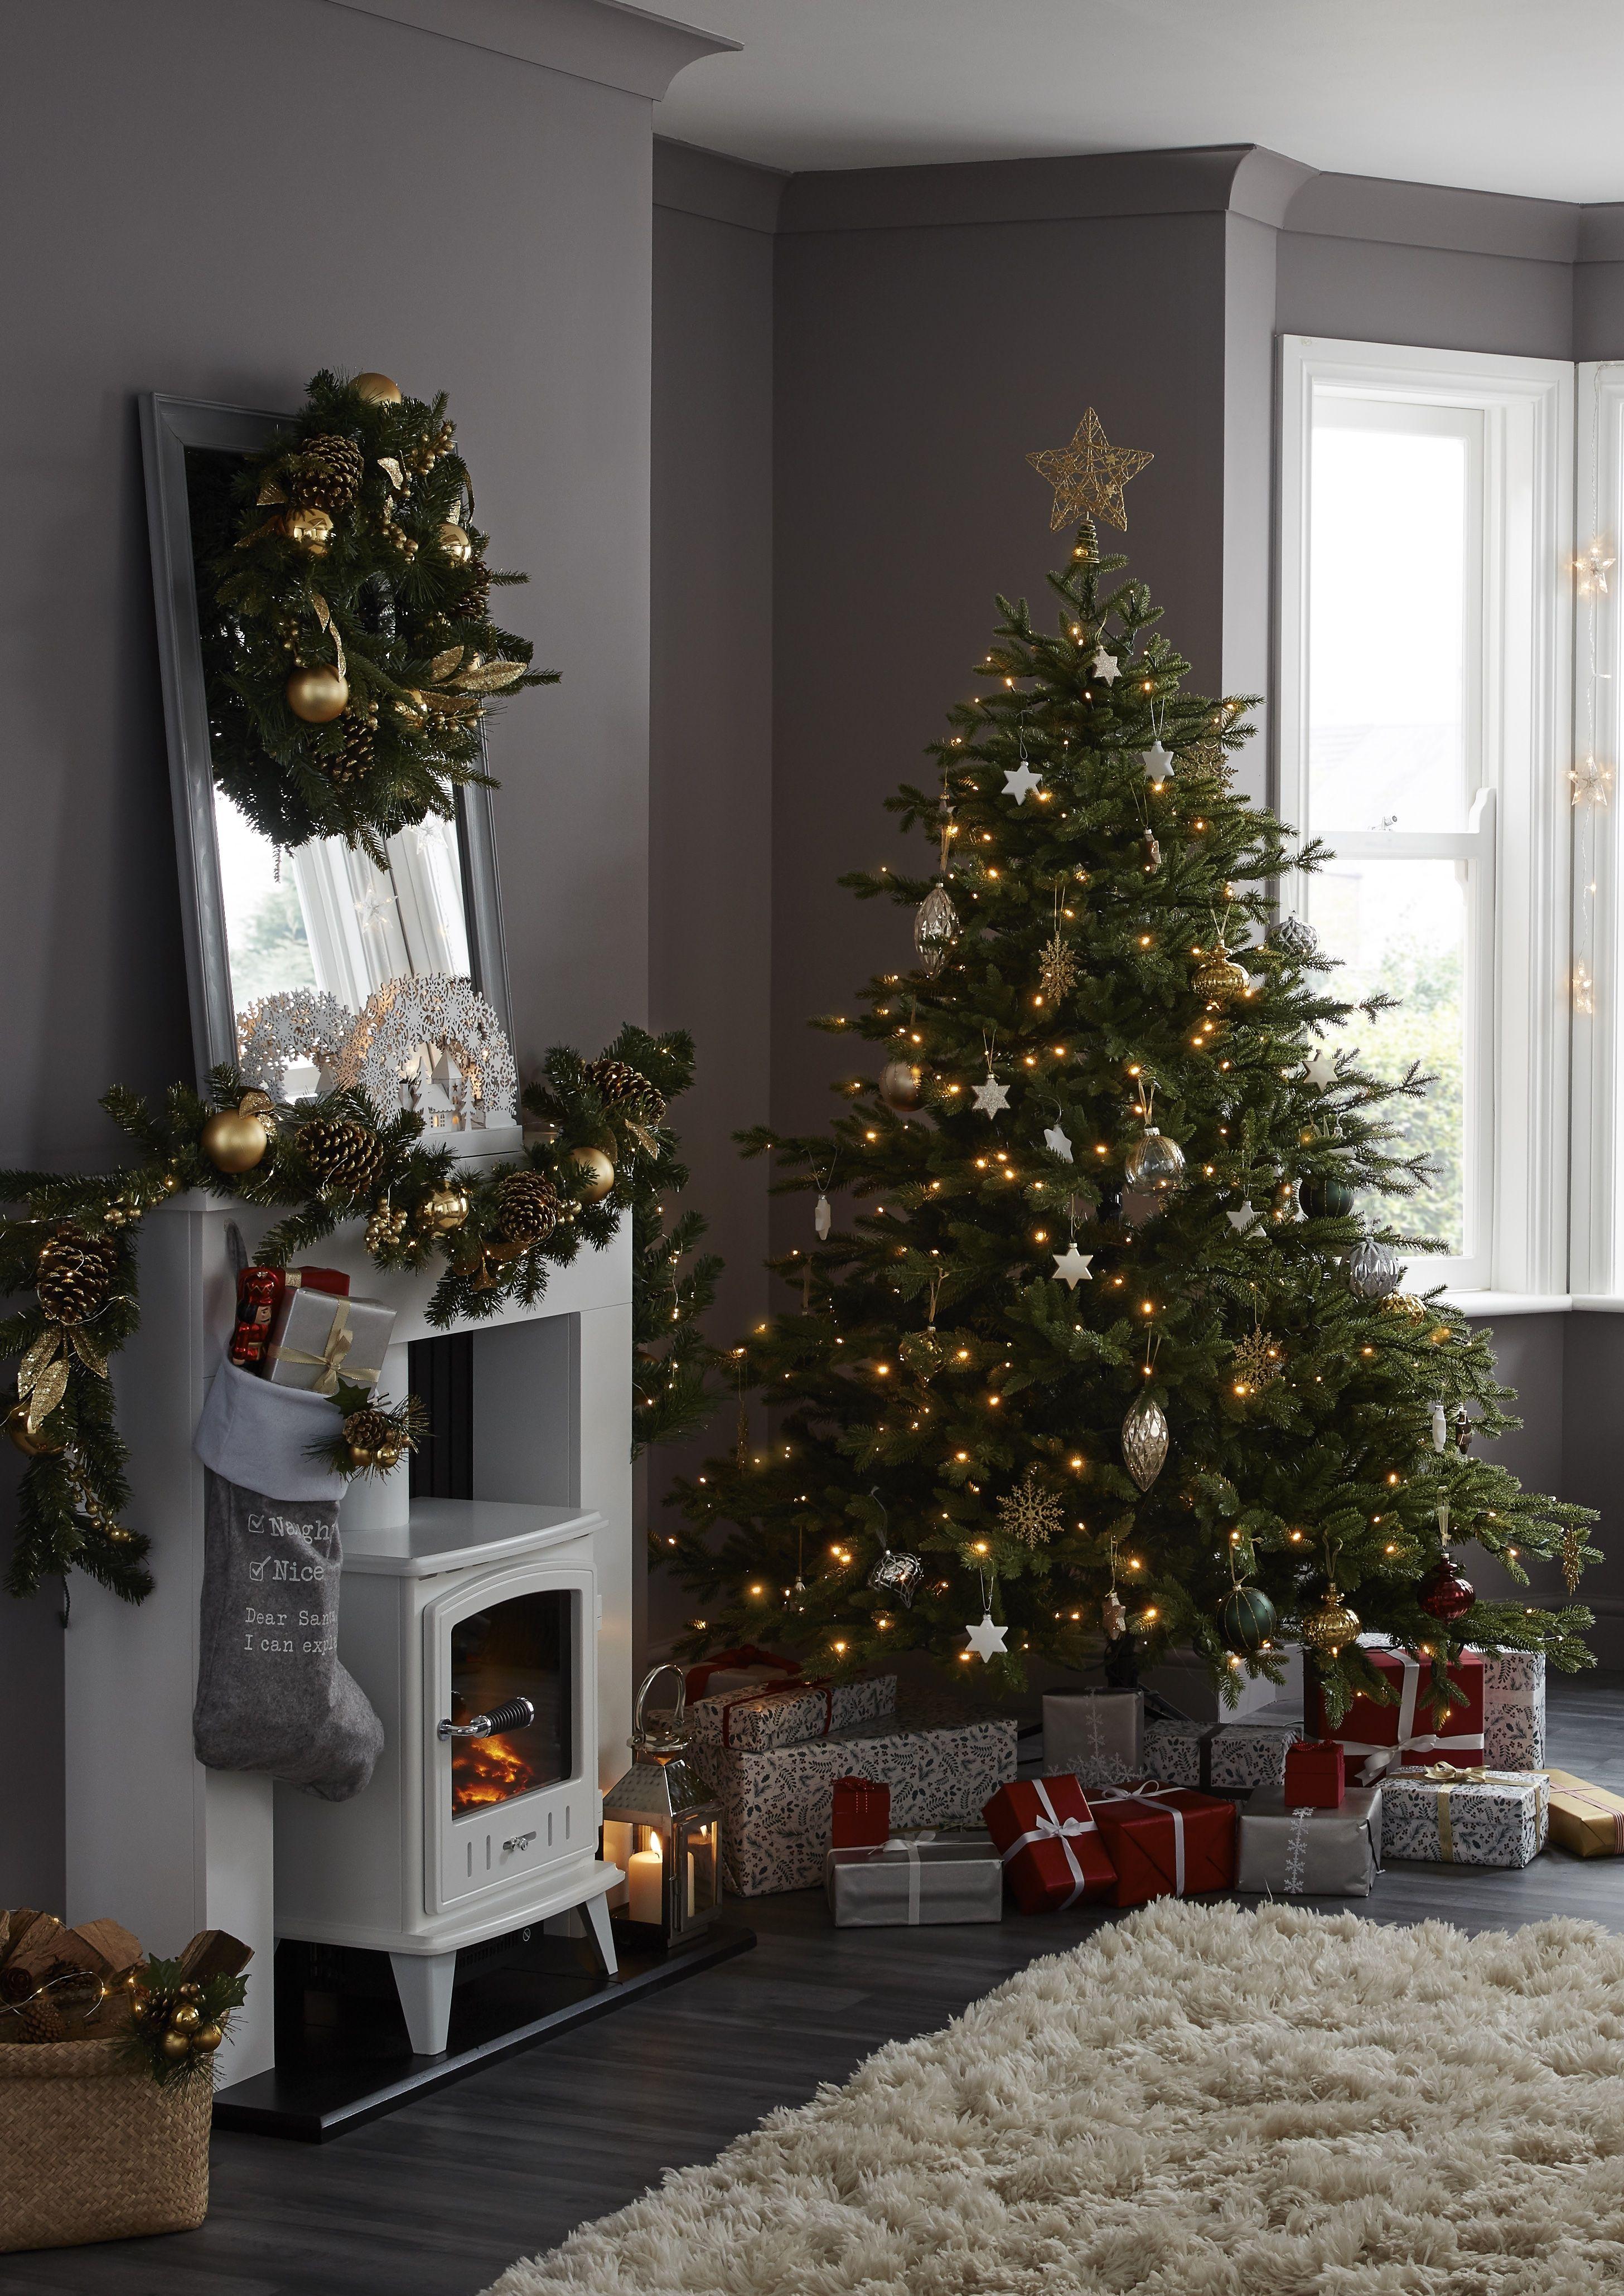 Pin by Natia Astakhishvili on Christmas and Winter photos